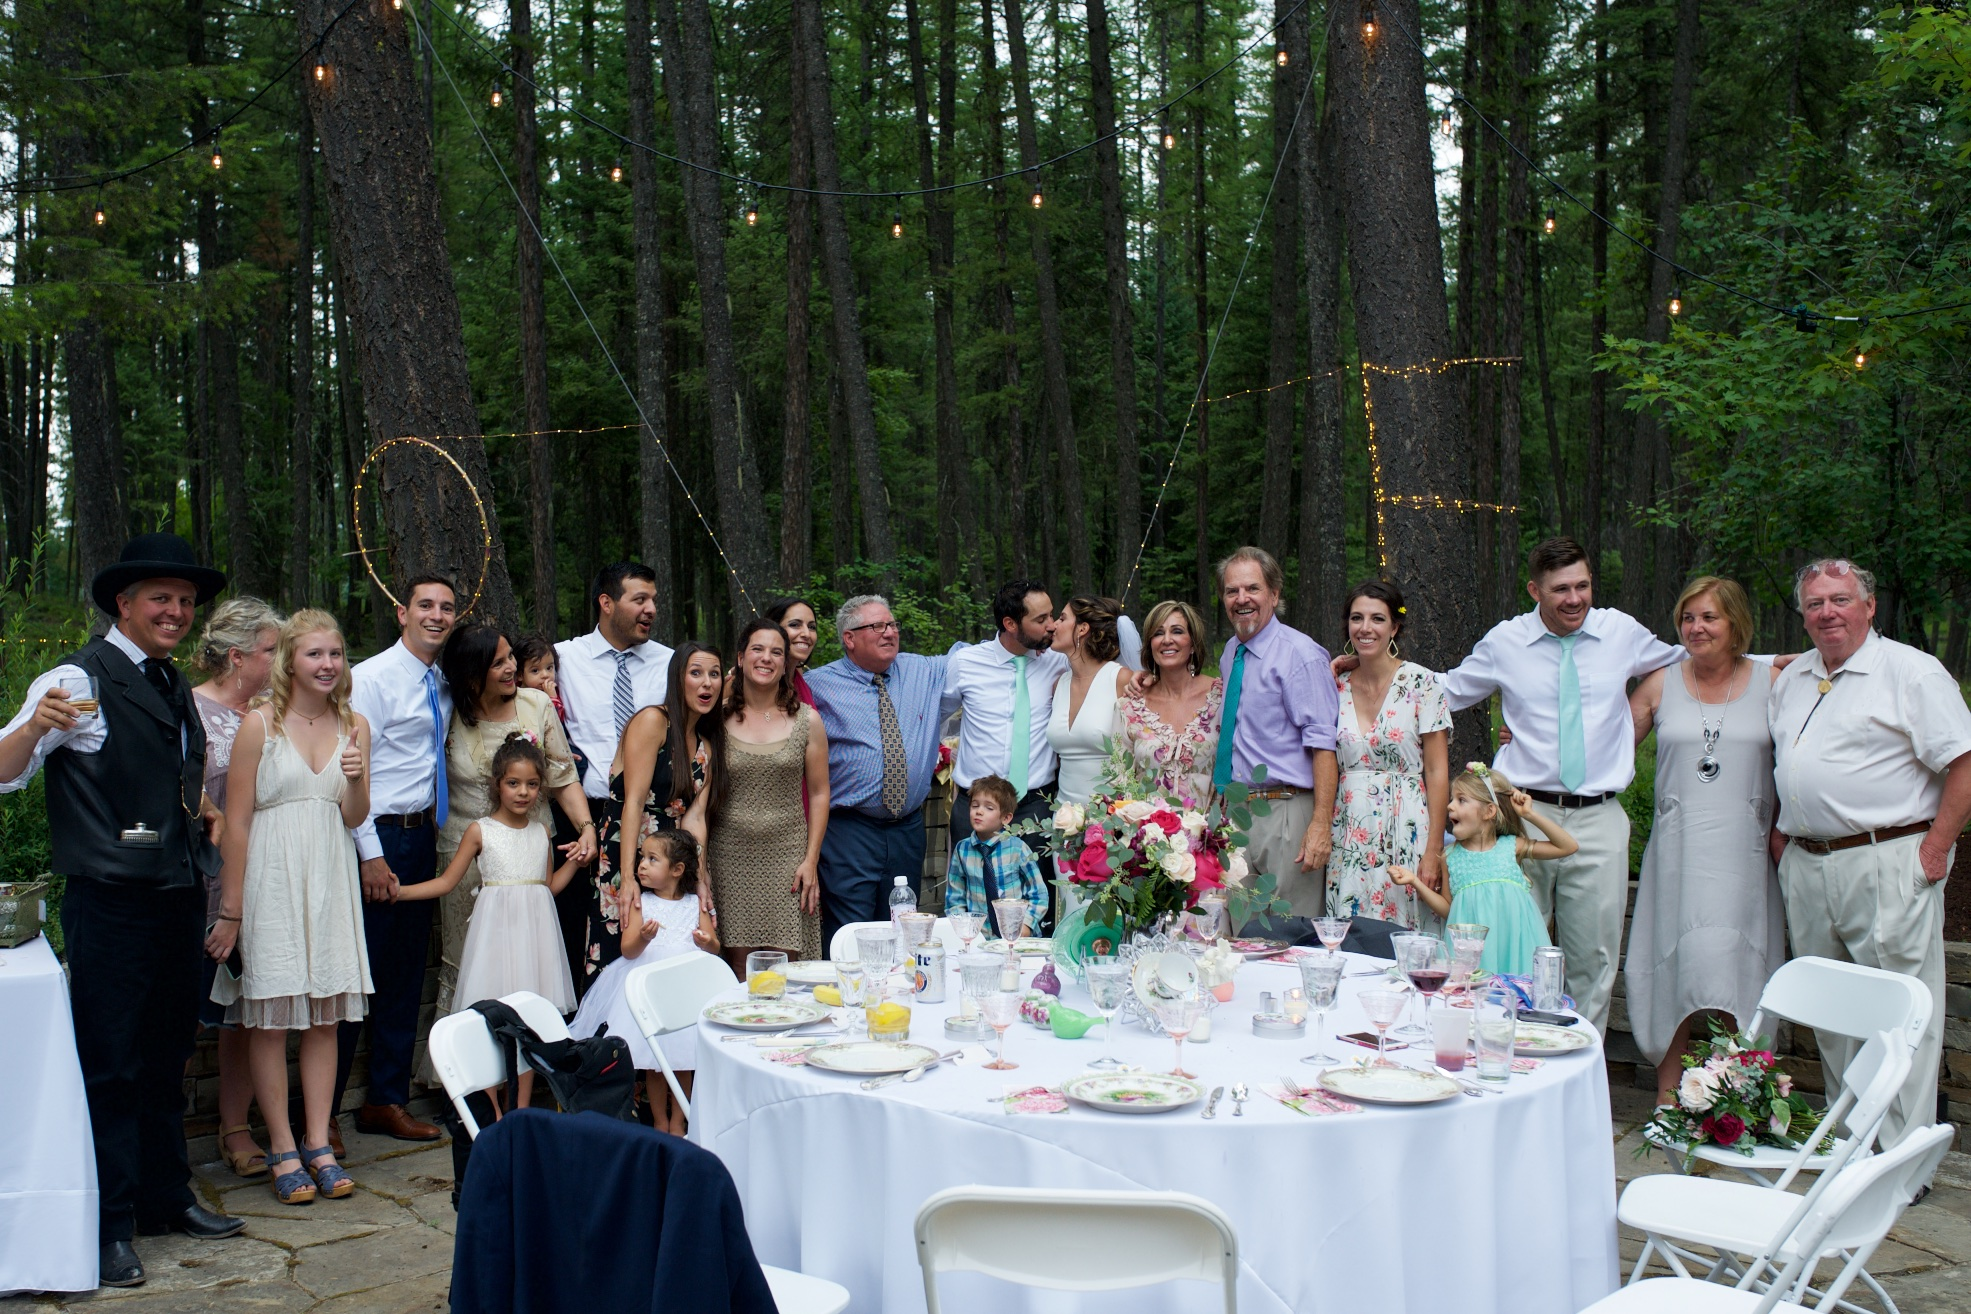 lindseyjane_wedding108.jpg